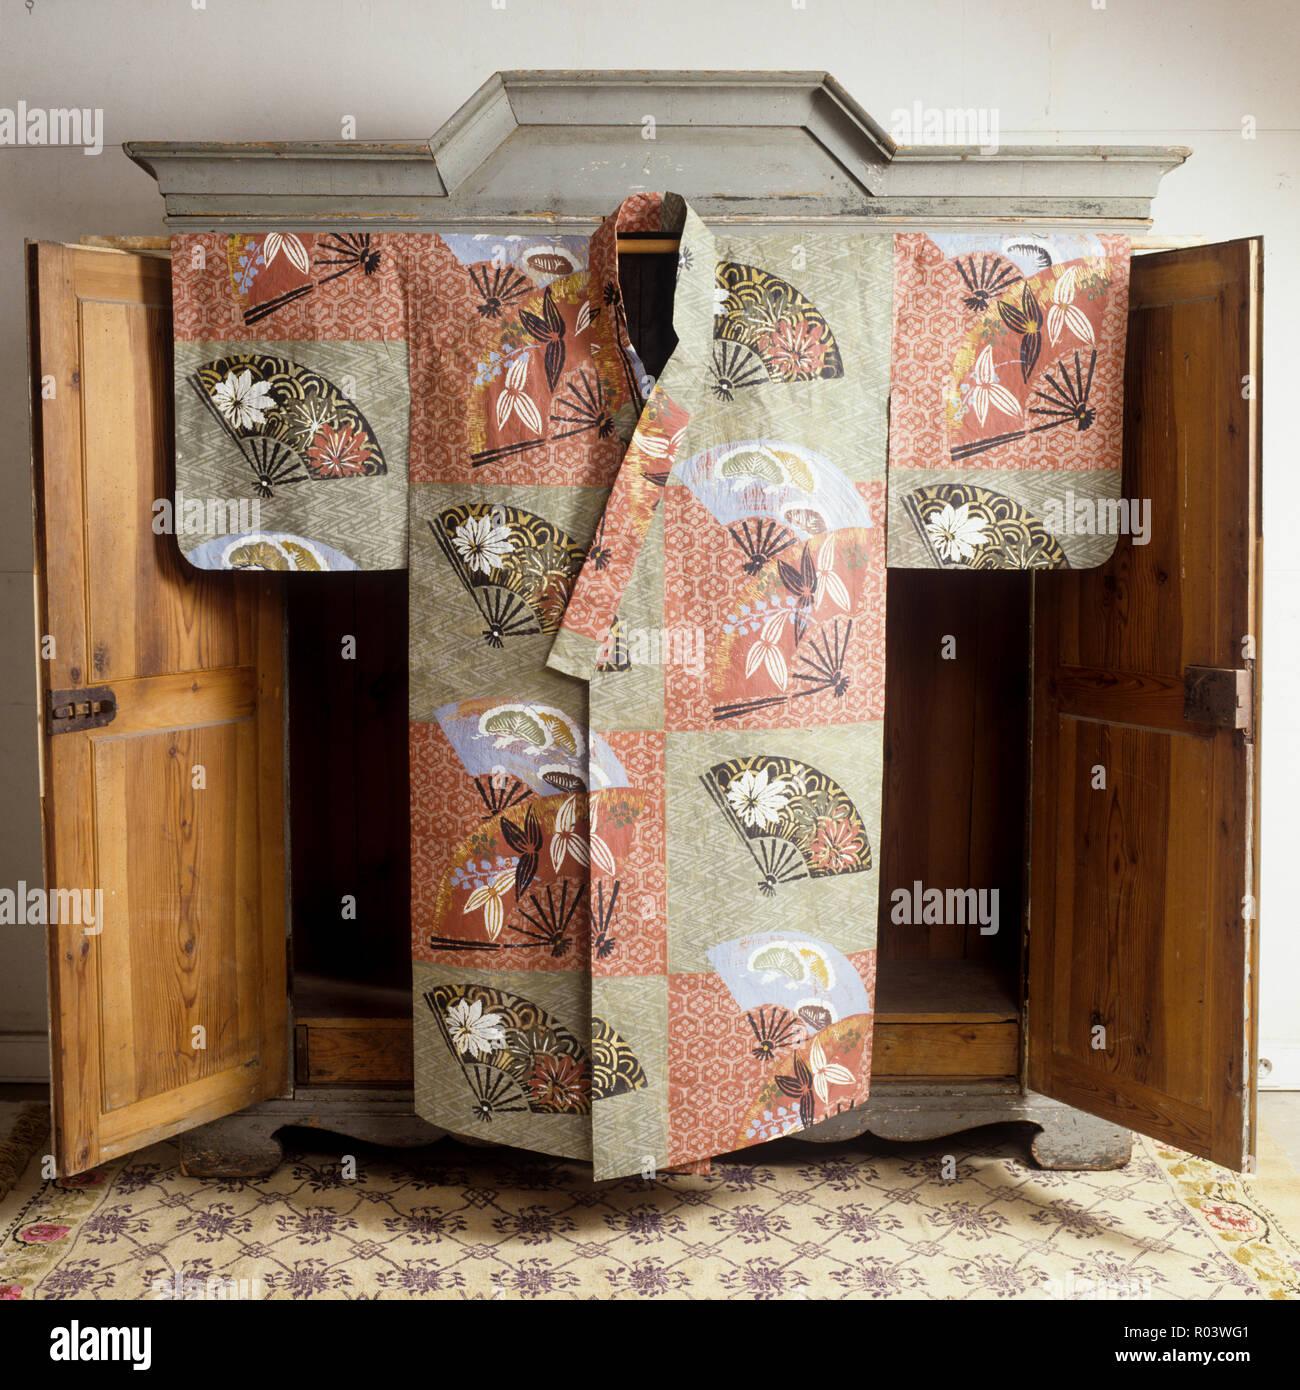 Oriental paper robe by Isabelle de Borchgrave - Stock Image